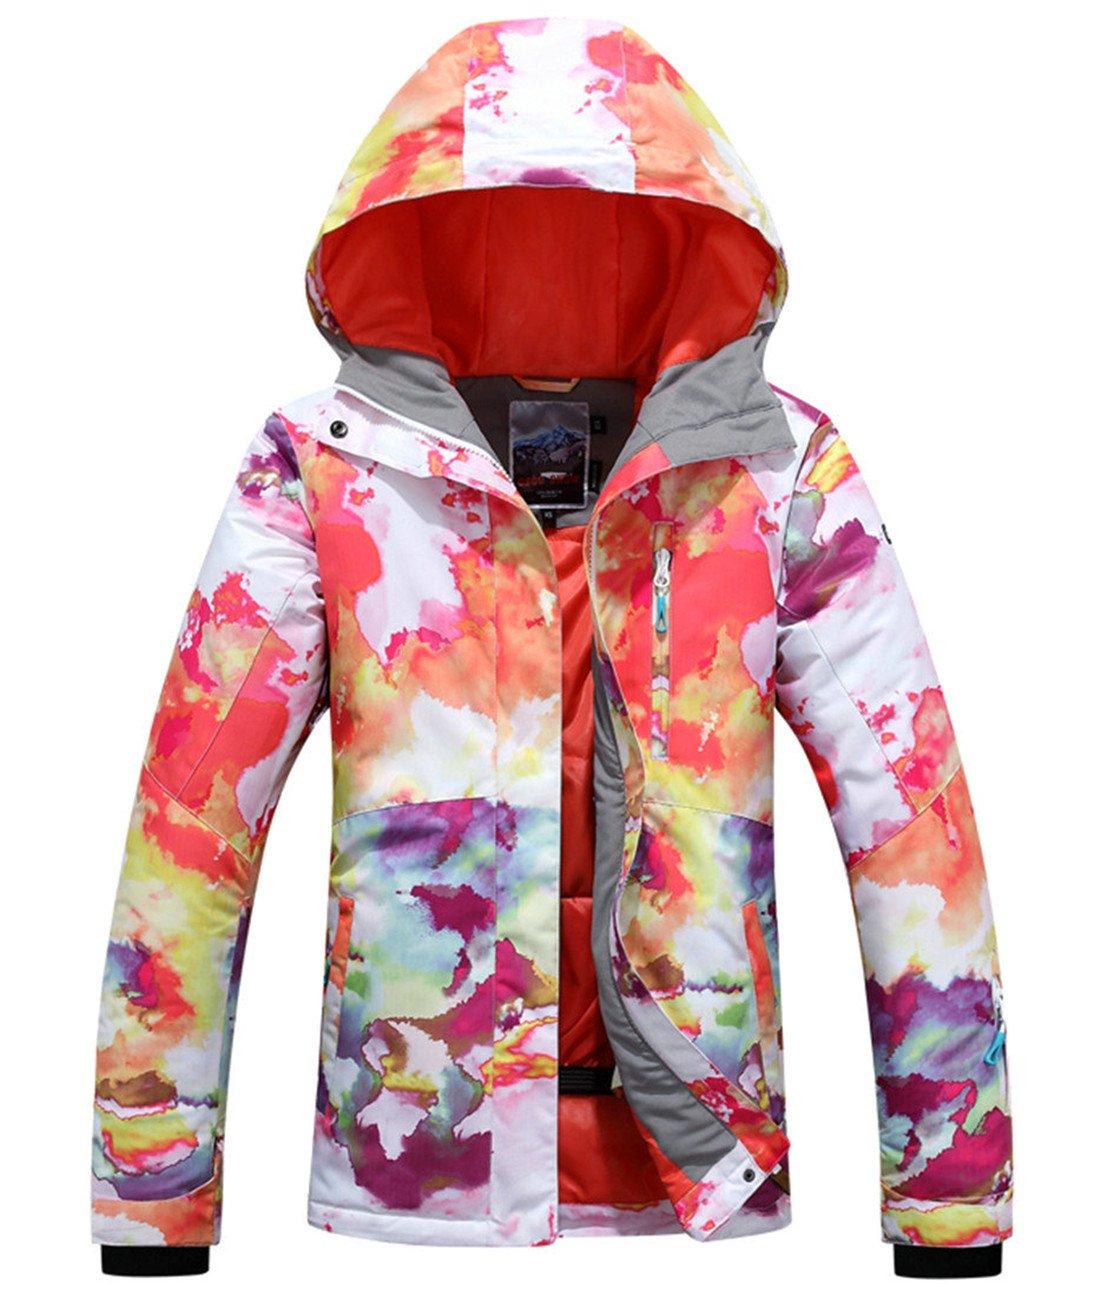 APTRO Women's Windproof Waterproof Bright Color Ski&Snowboarding Jacket #514 Size L